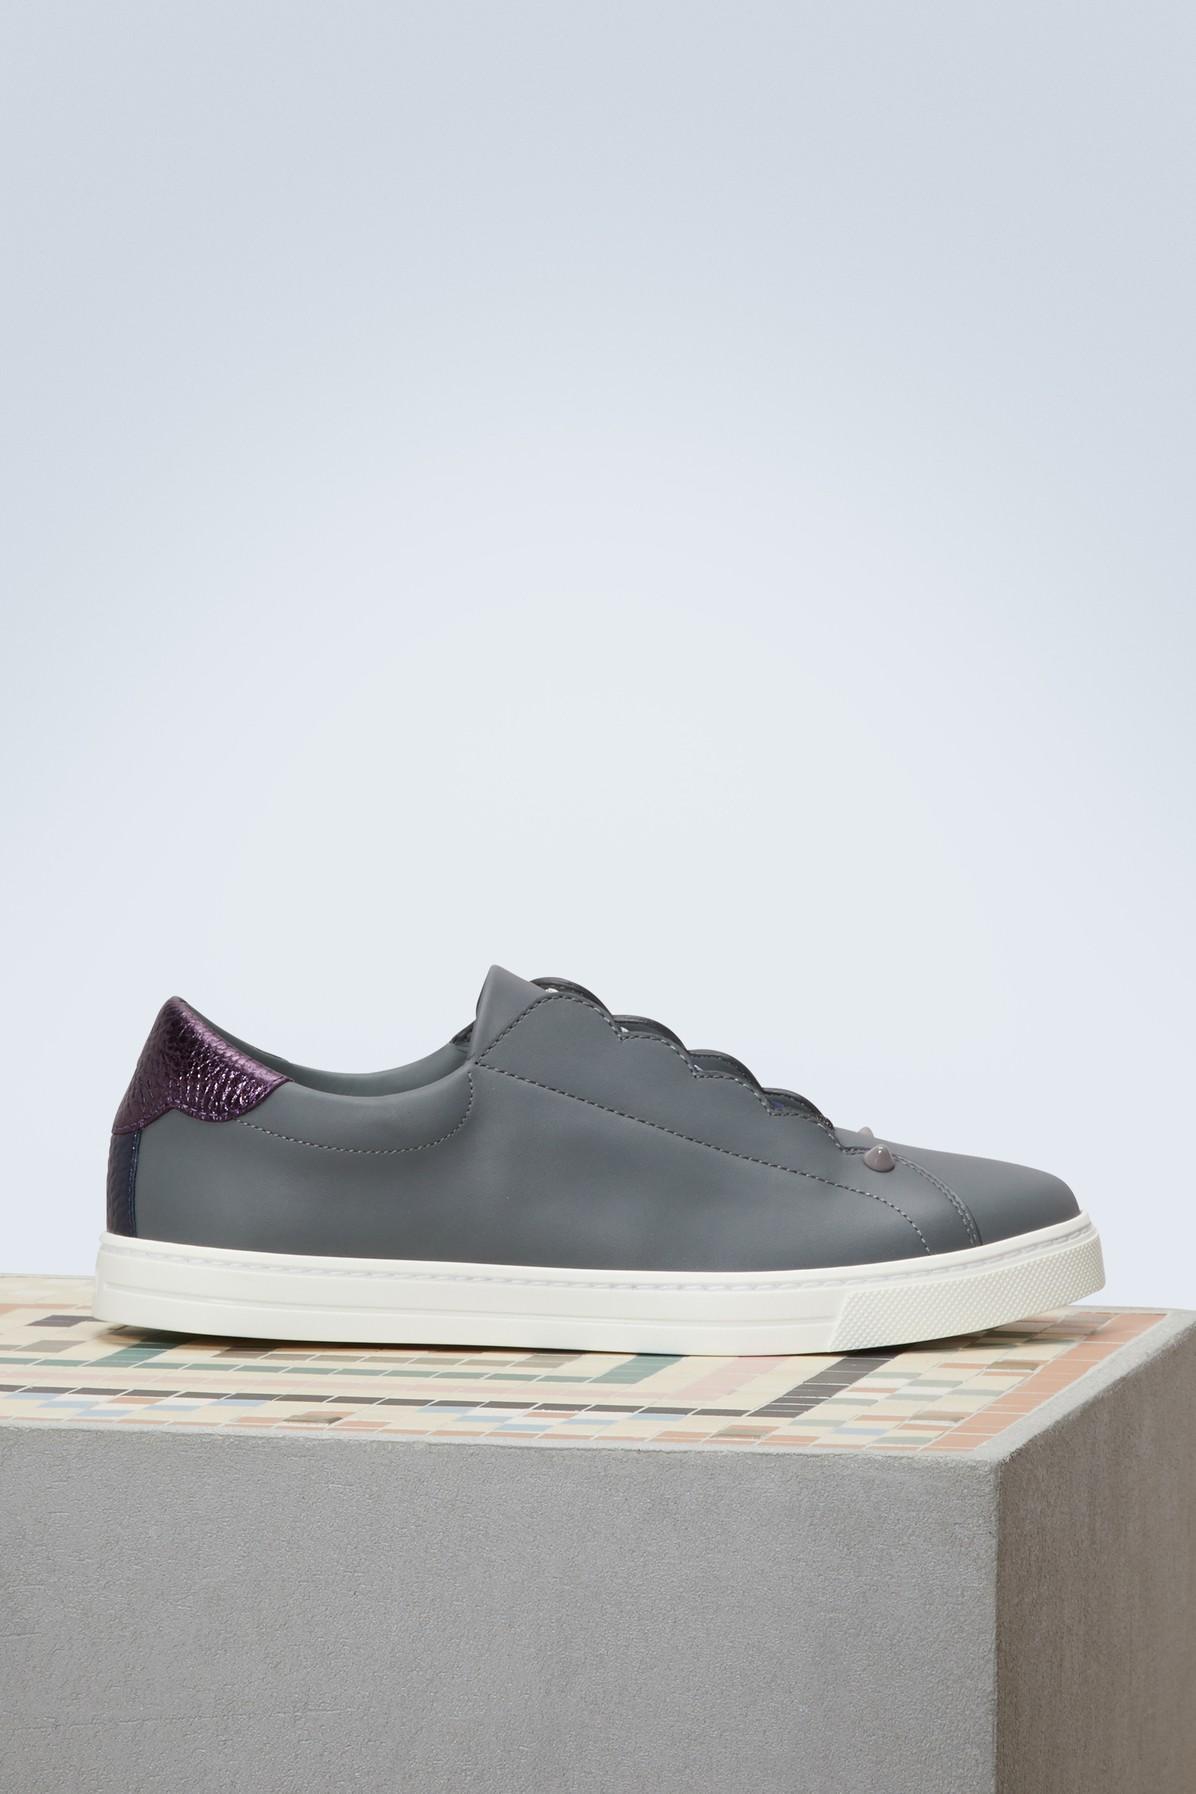 Fendi Low-top Sneakers In Alg+amar+b.berry+mlc